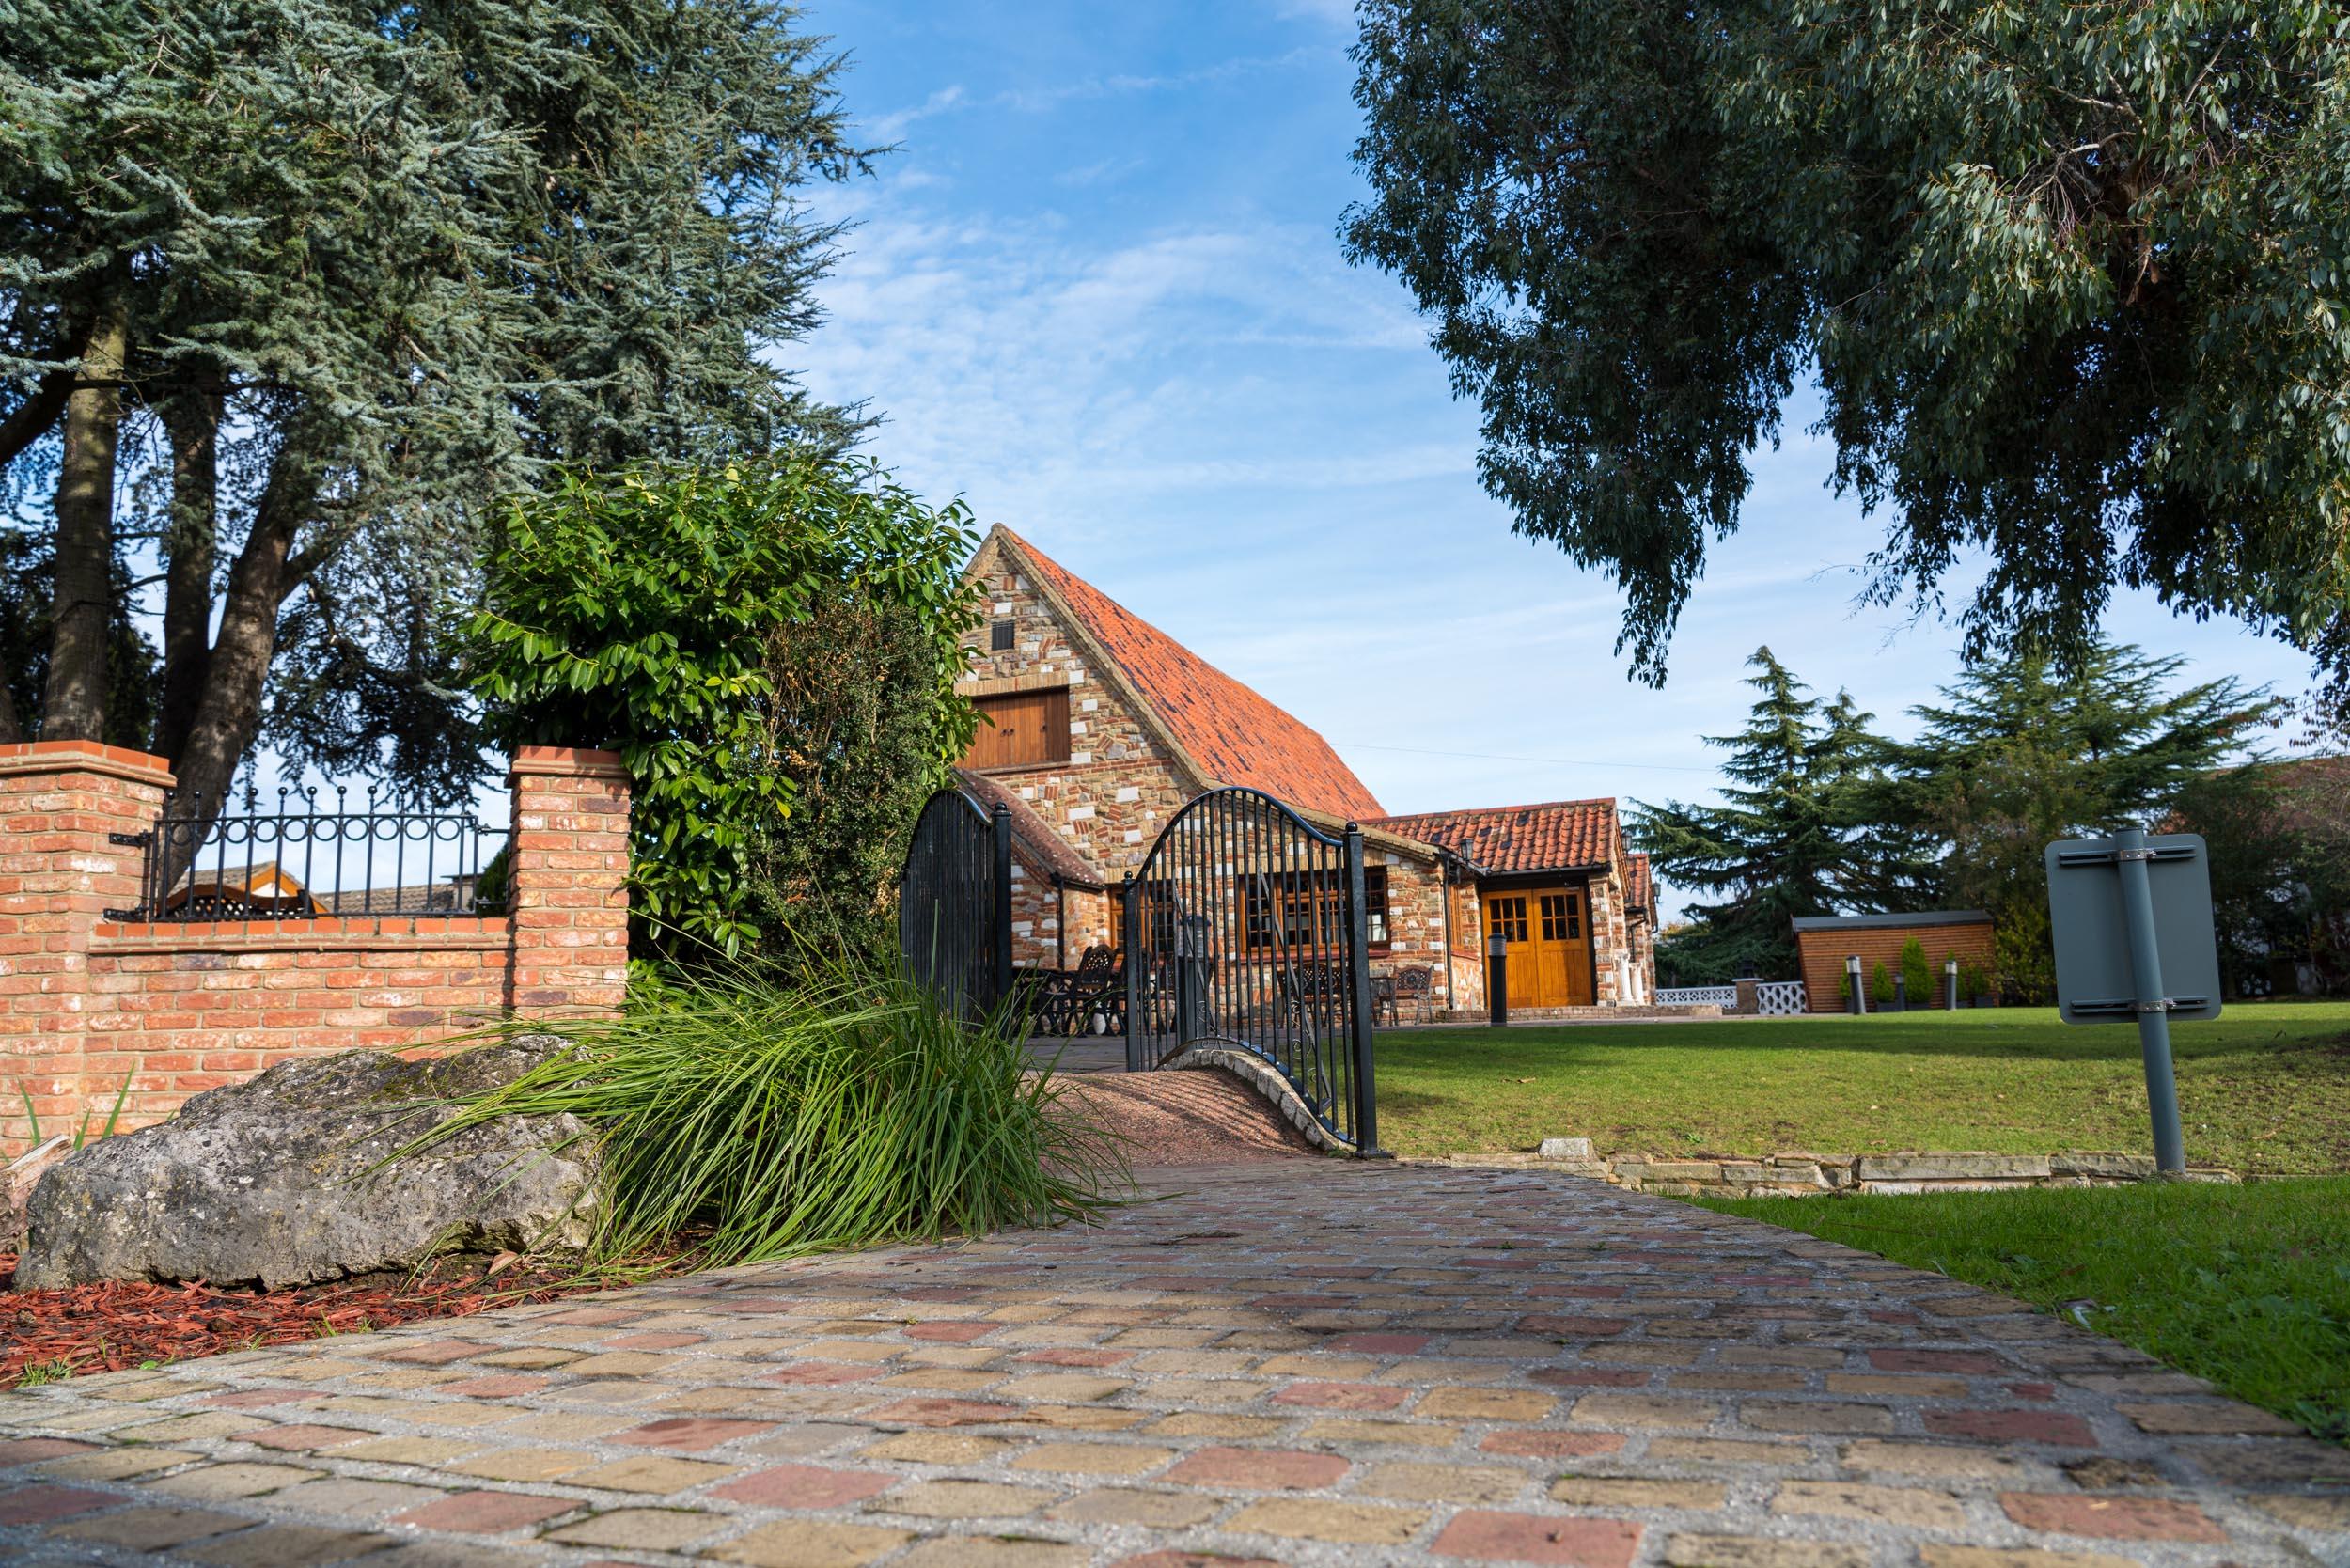 Ye Olde Plough House Patio Area